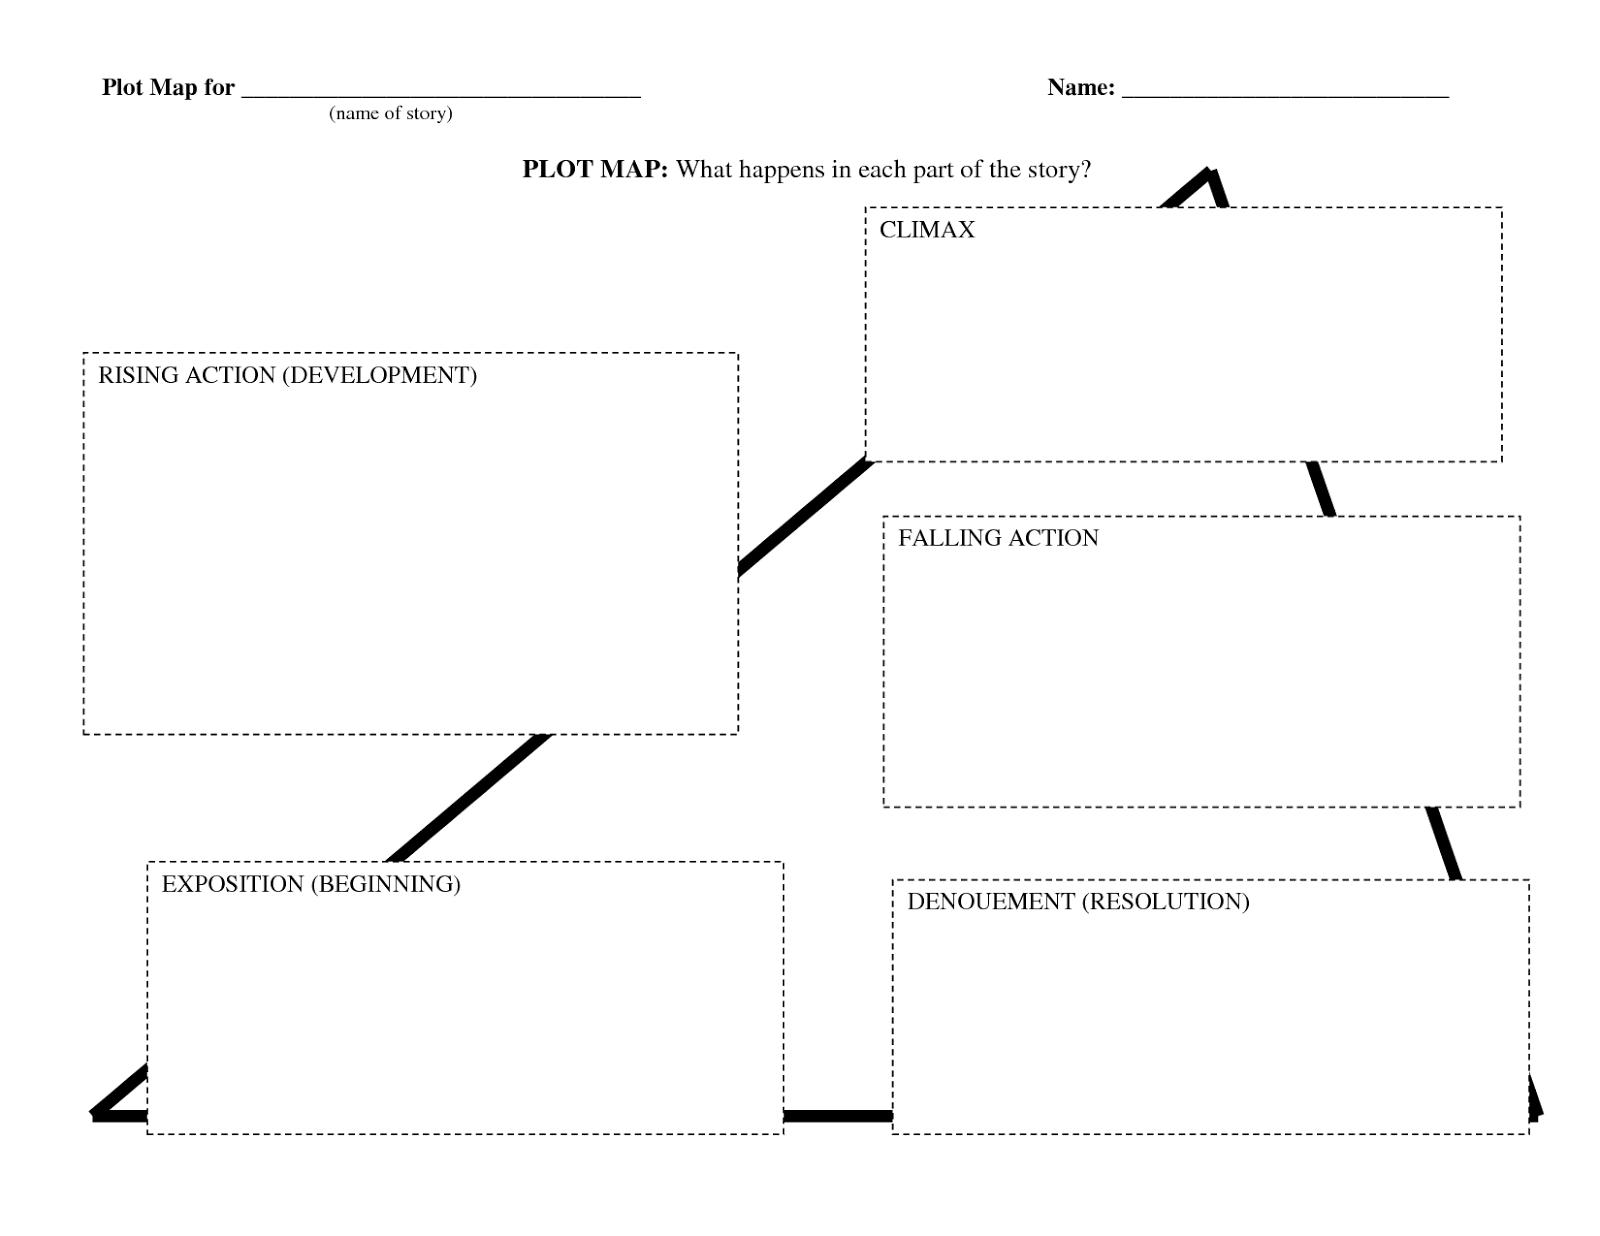 small resolution of di croce st simon dec 18 novel study plot diagram prezi rh stsimondicroce blogspot com printable plot diagram story plot diagram example